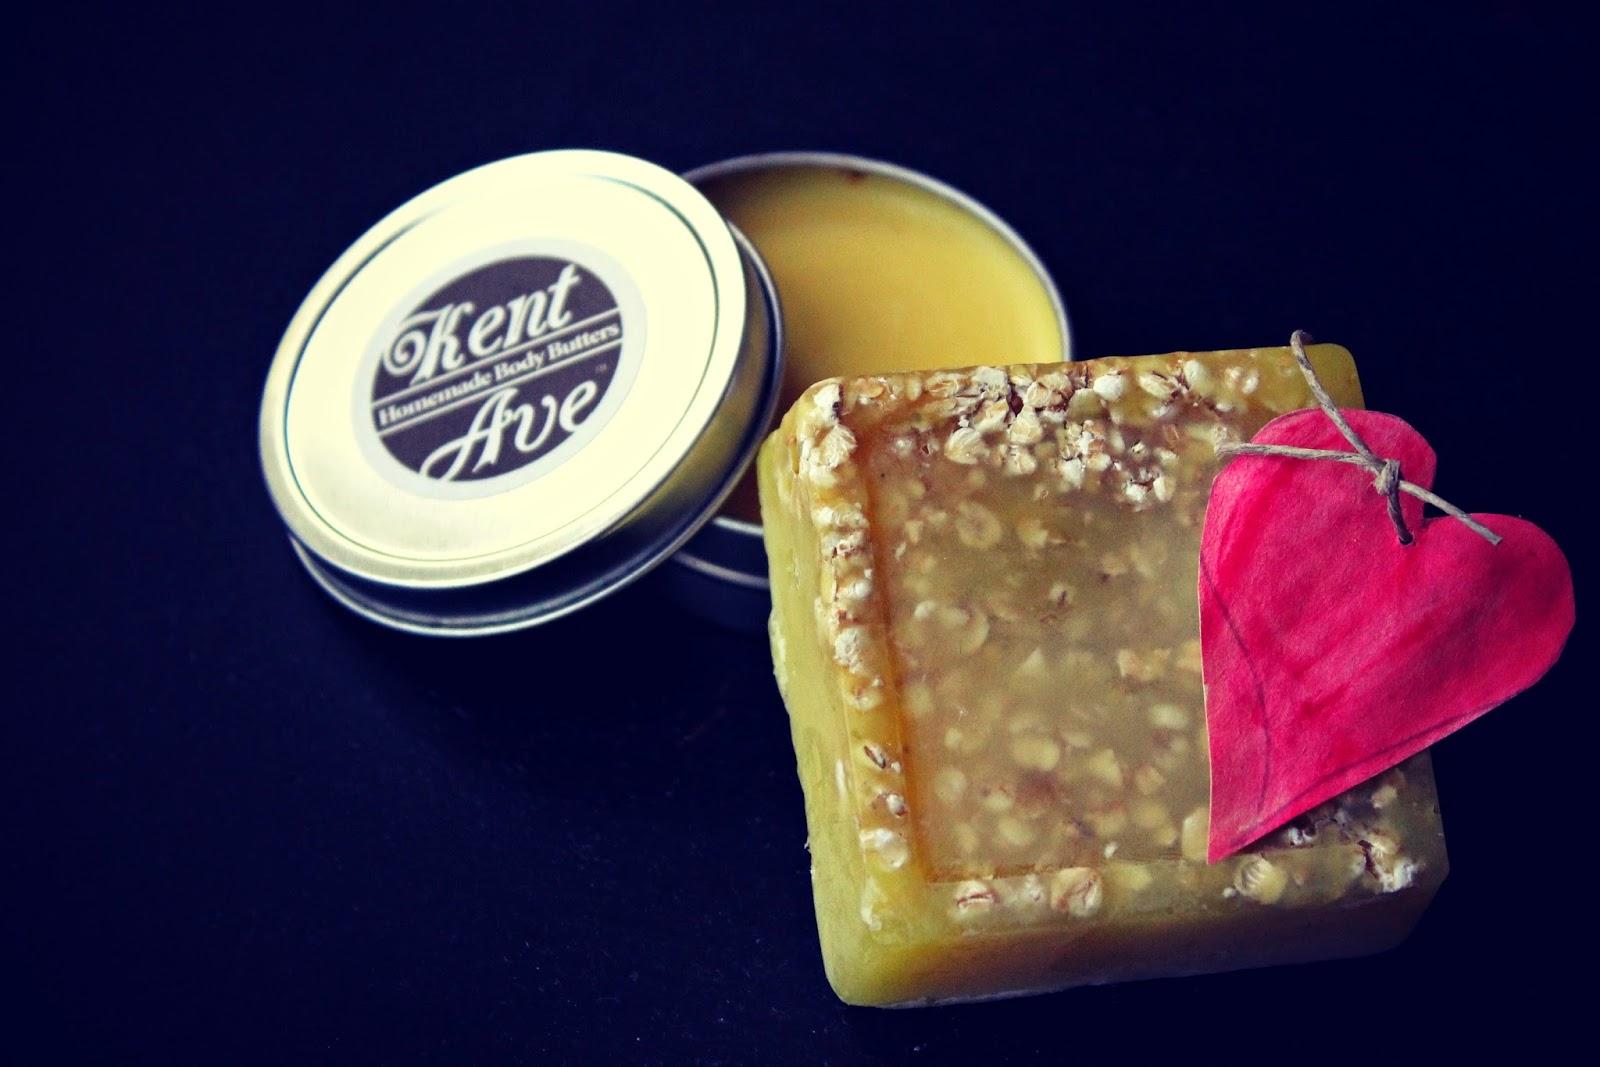 Kent Ave. Mango Peruvia Skincare Giveaway